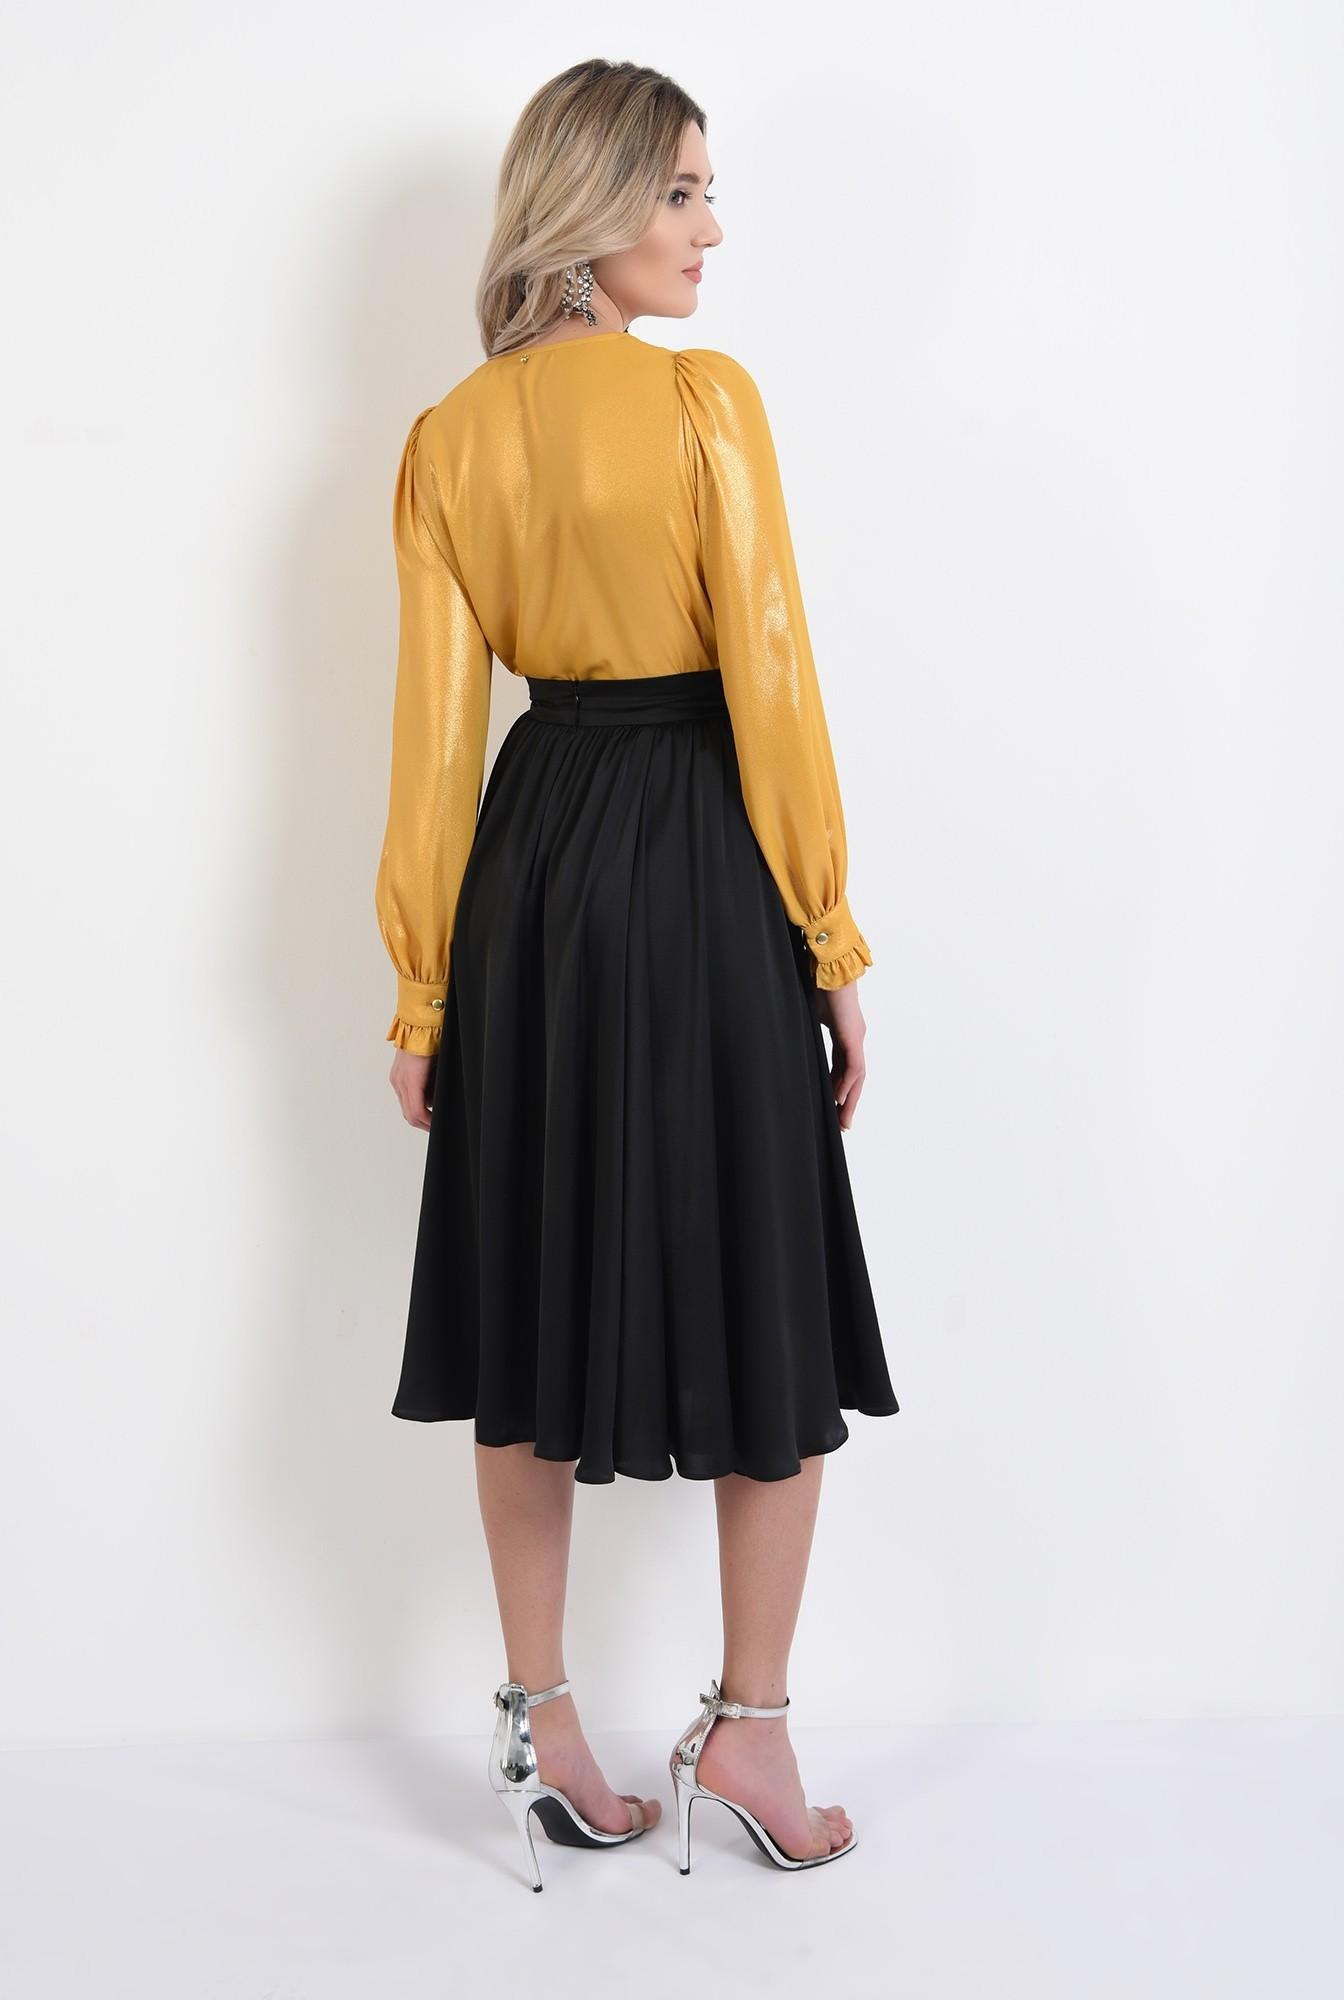 1 -  bluza eleganta, mustar, cu maneci bufante, cu anchior, tesatura lucioasa